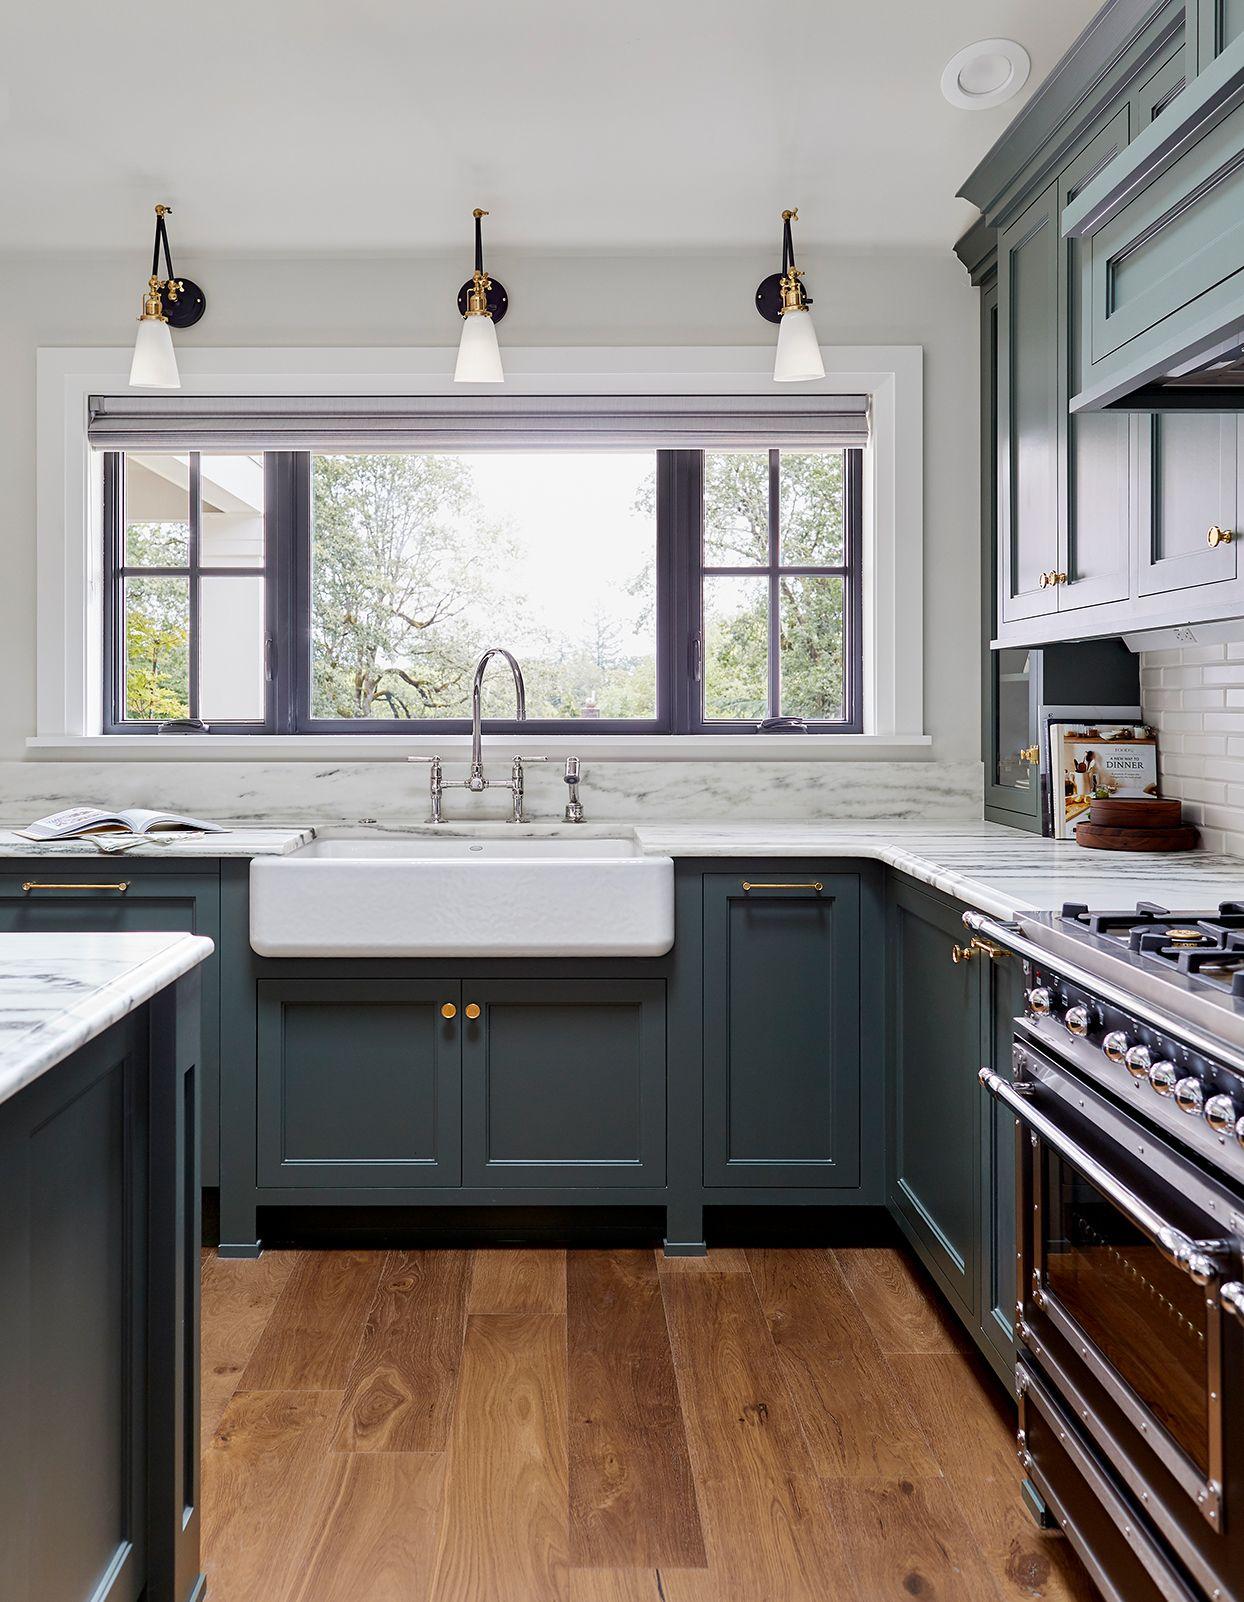 11 Gorgeous Marble Backsplashes That Ll Refresh Any Kitchen New Kitchen Cabinets Shaker Kitchen Cabinets Kitchen Design